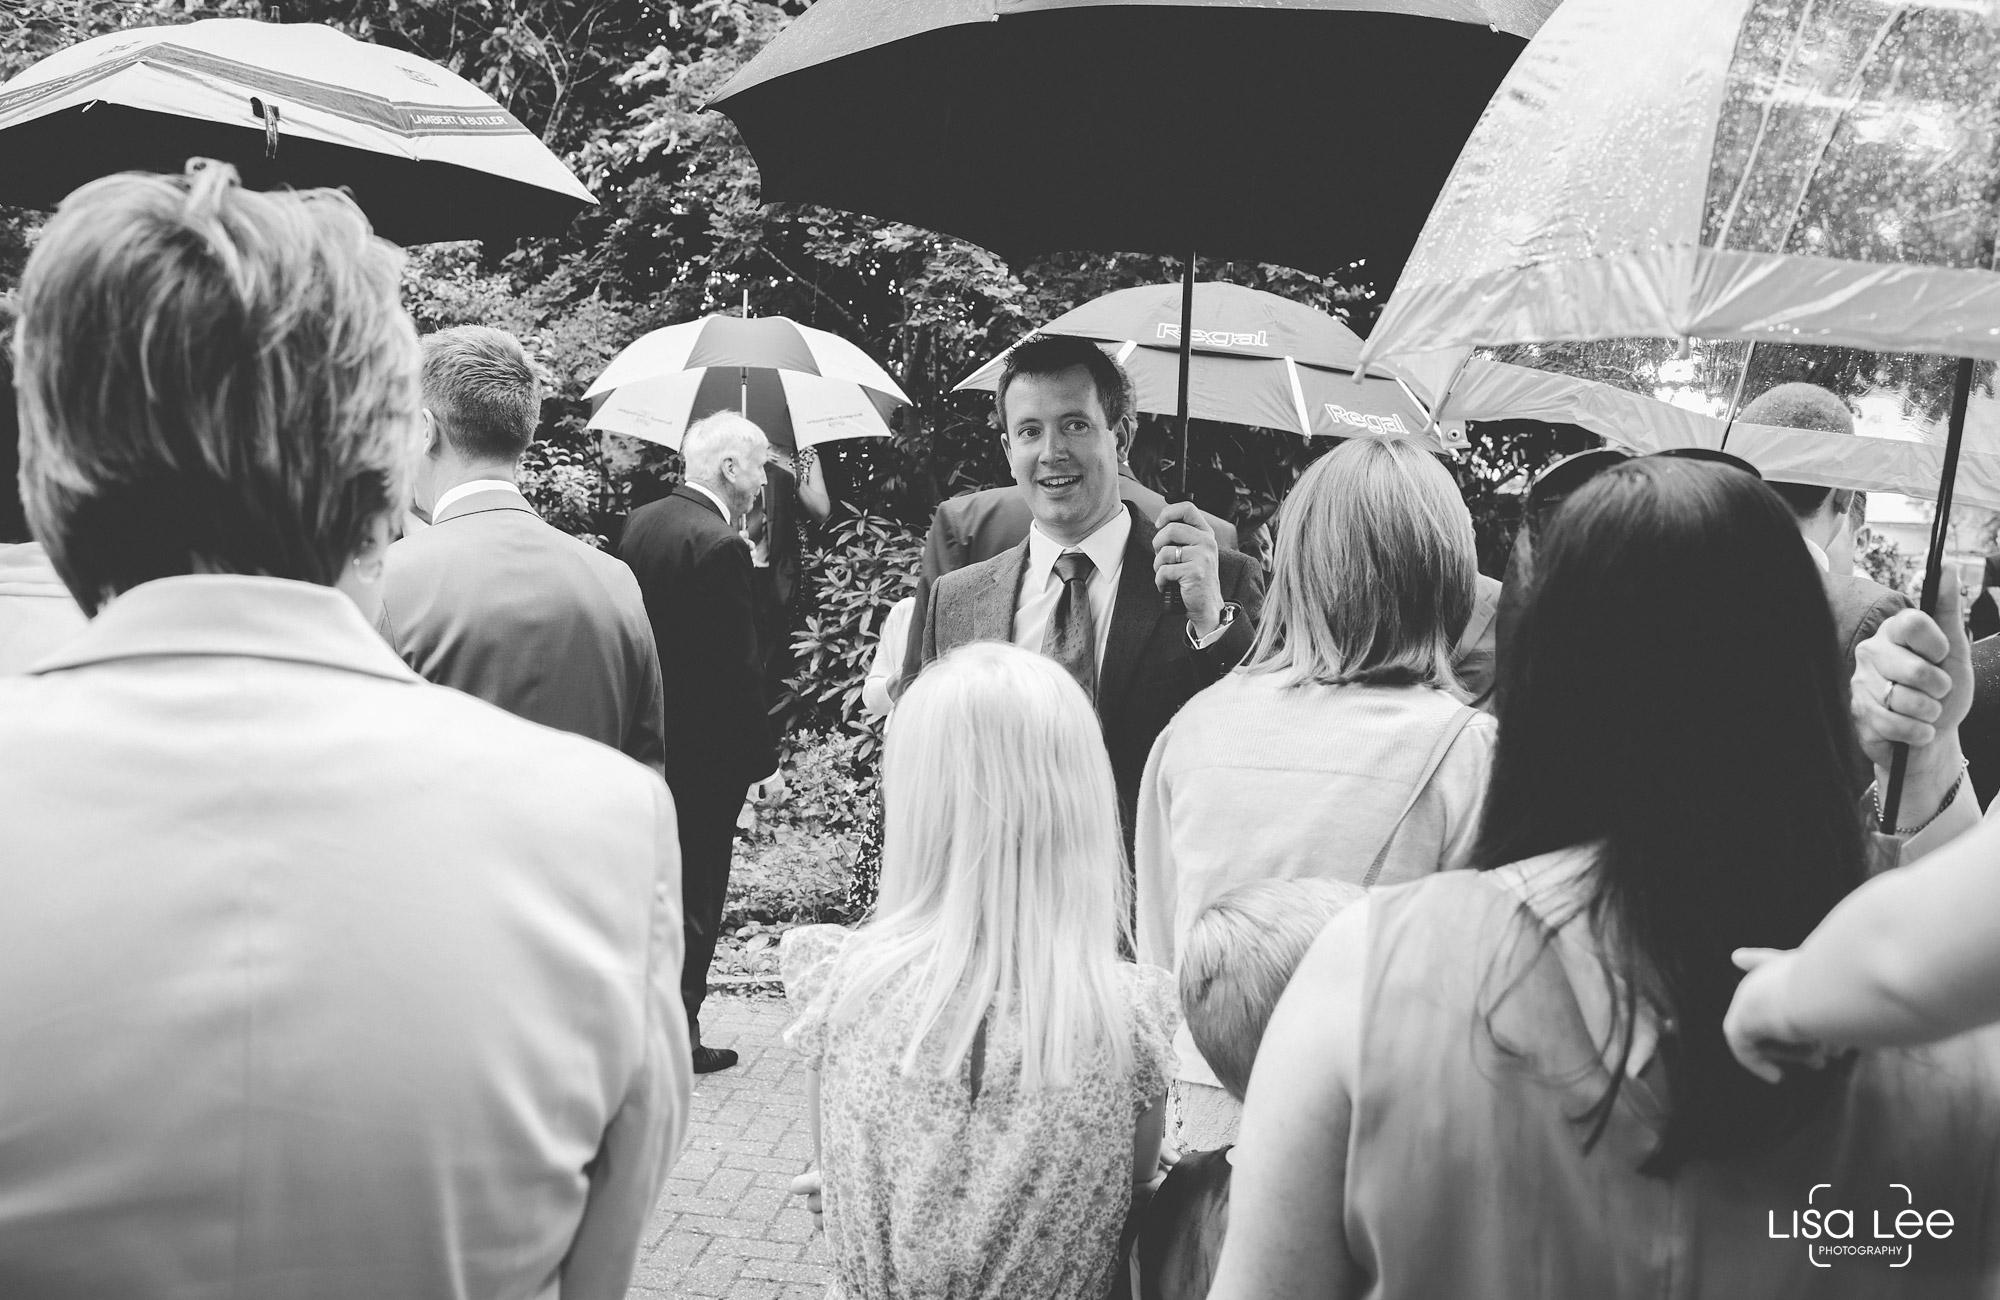 lisa-lee-wedding-photography-burton-raining.jpg